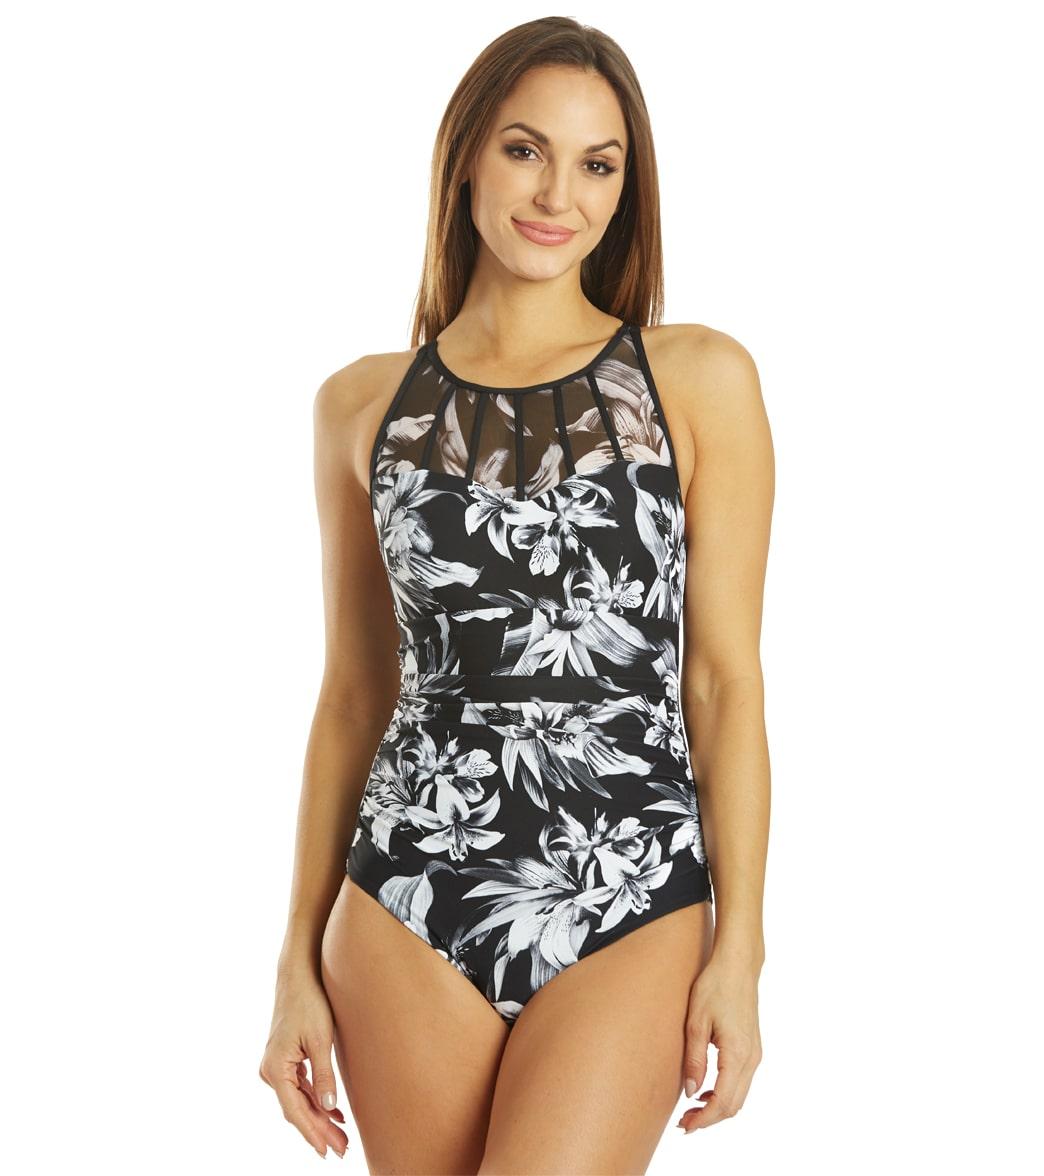 Azura Mastectomy Contour Belladonna High Neck One Piece Swimsuit